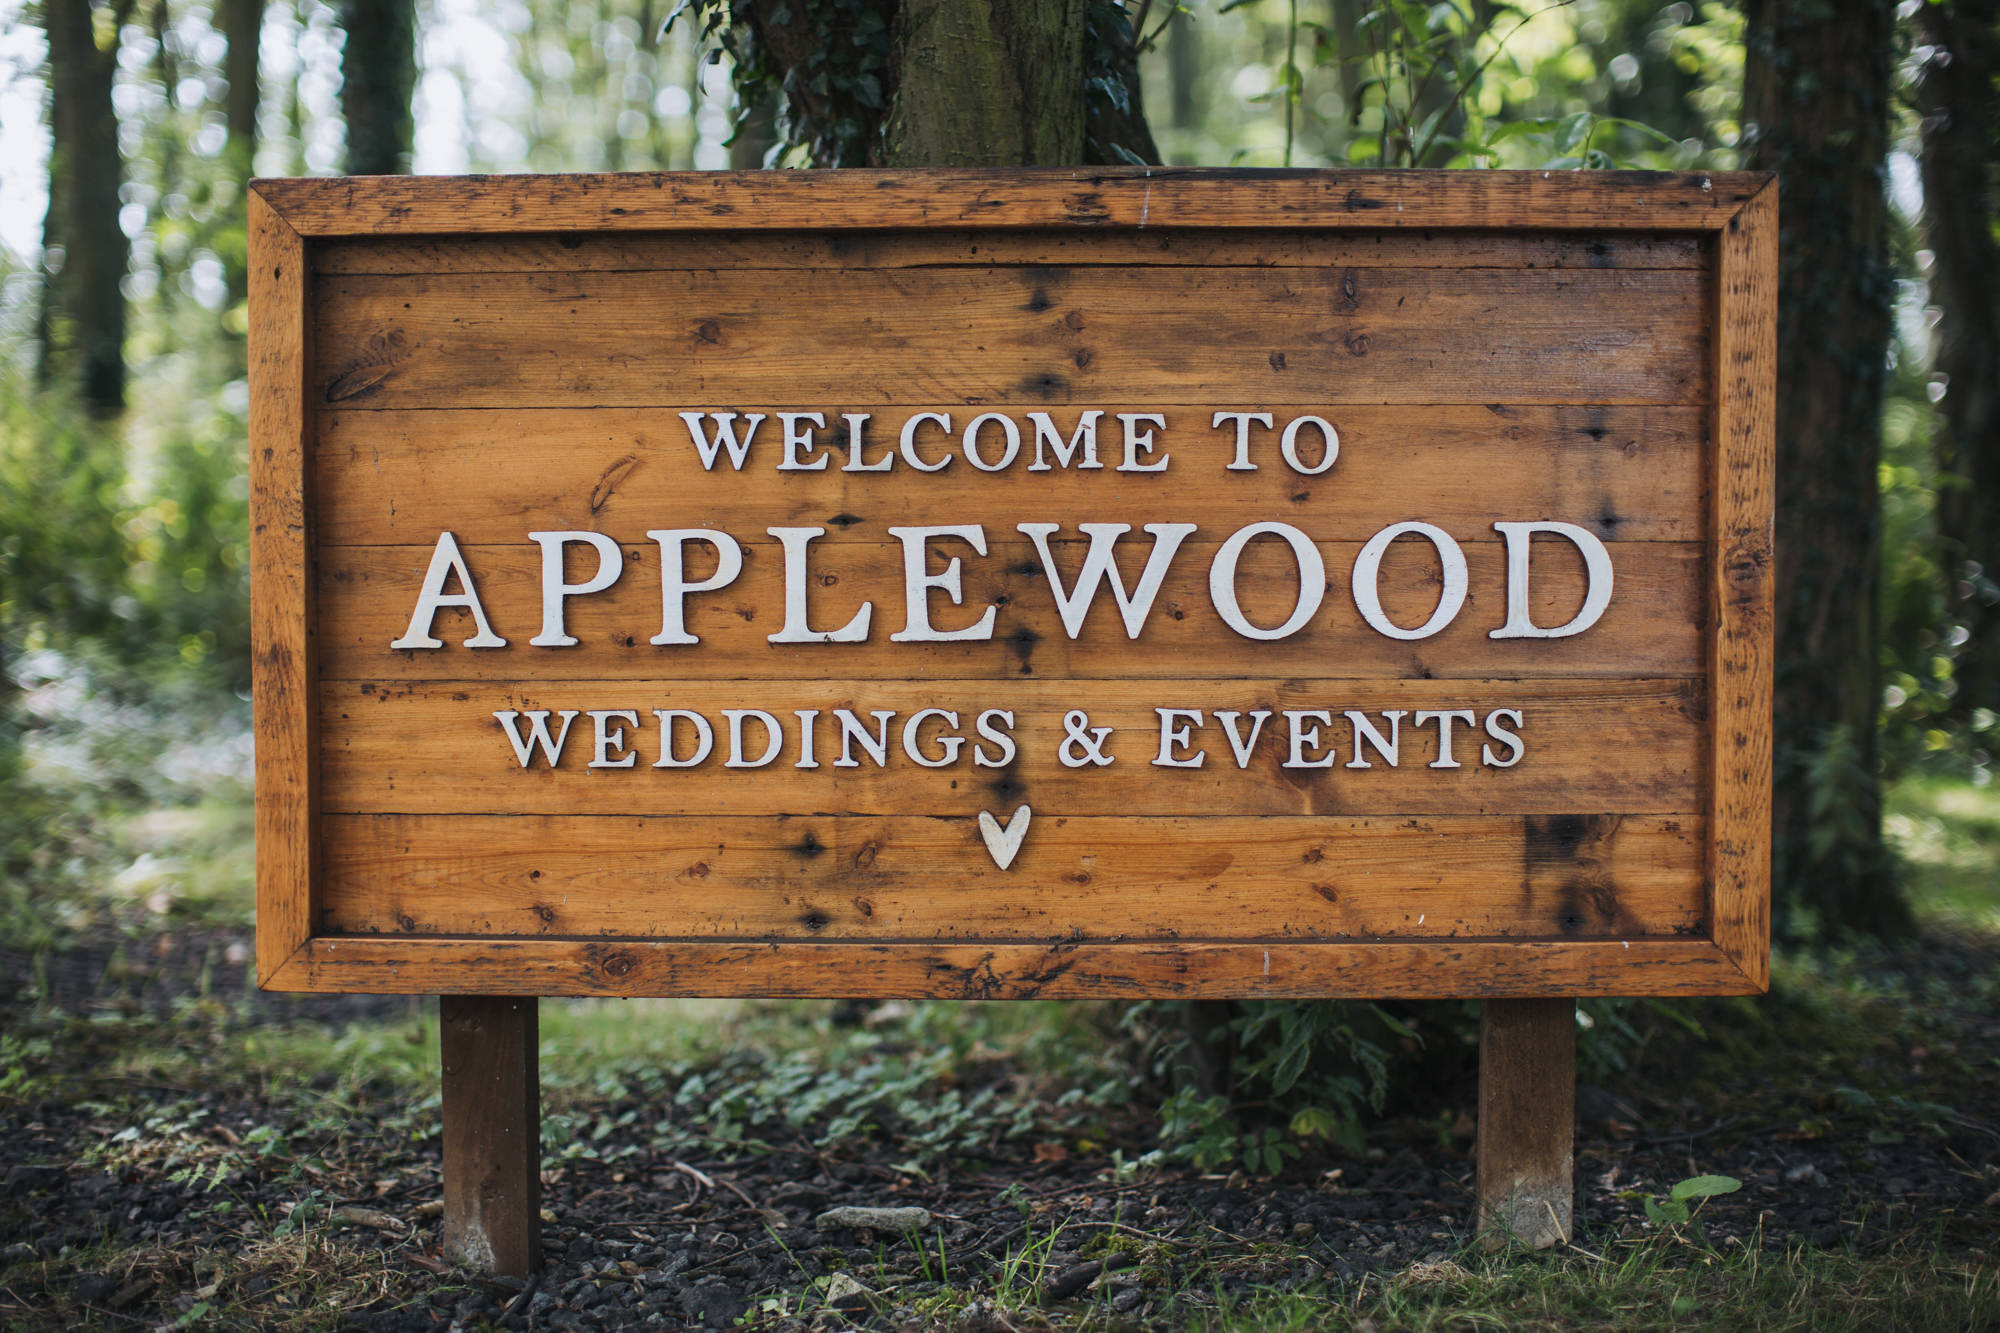 applewood wedding photographer leeds, yorkshire10.jpg